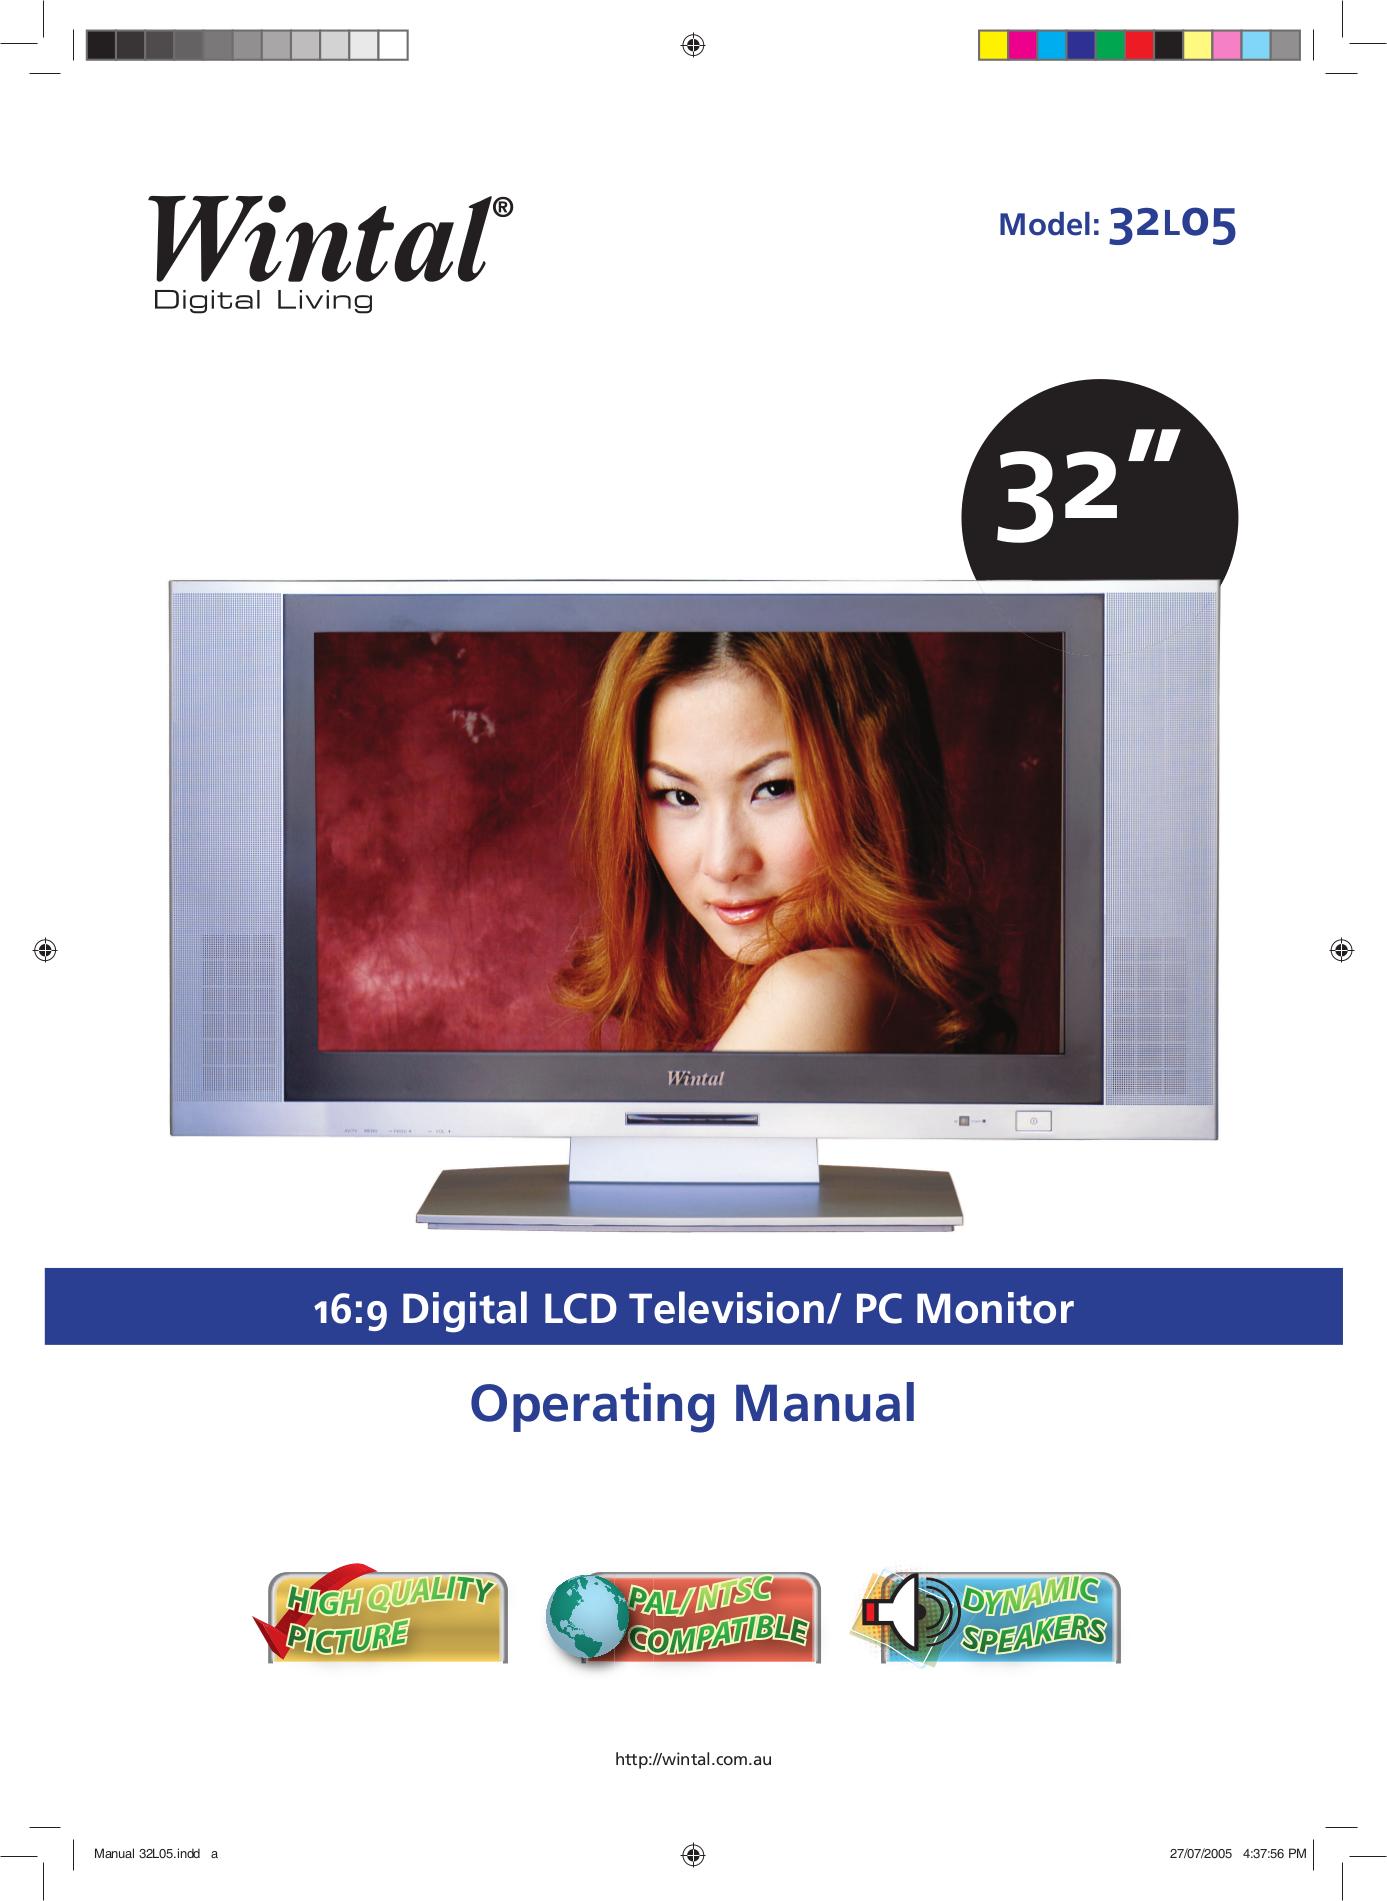 pdf for Wintal TV 32L05 manual